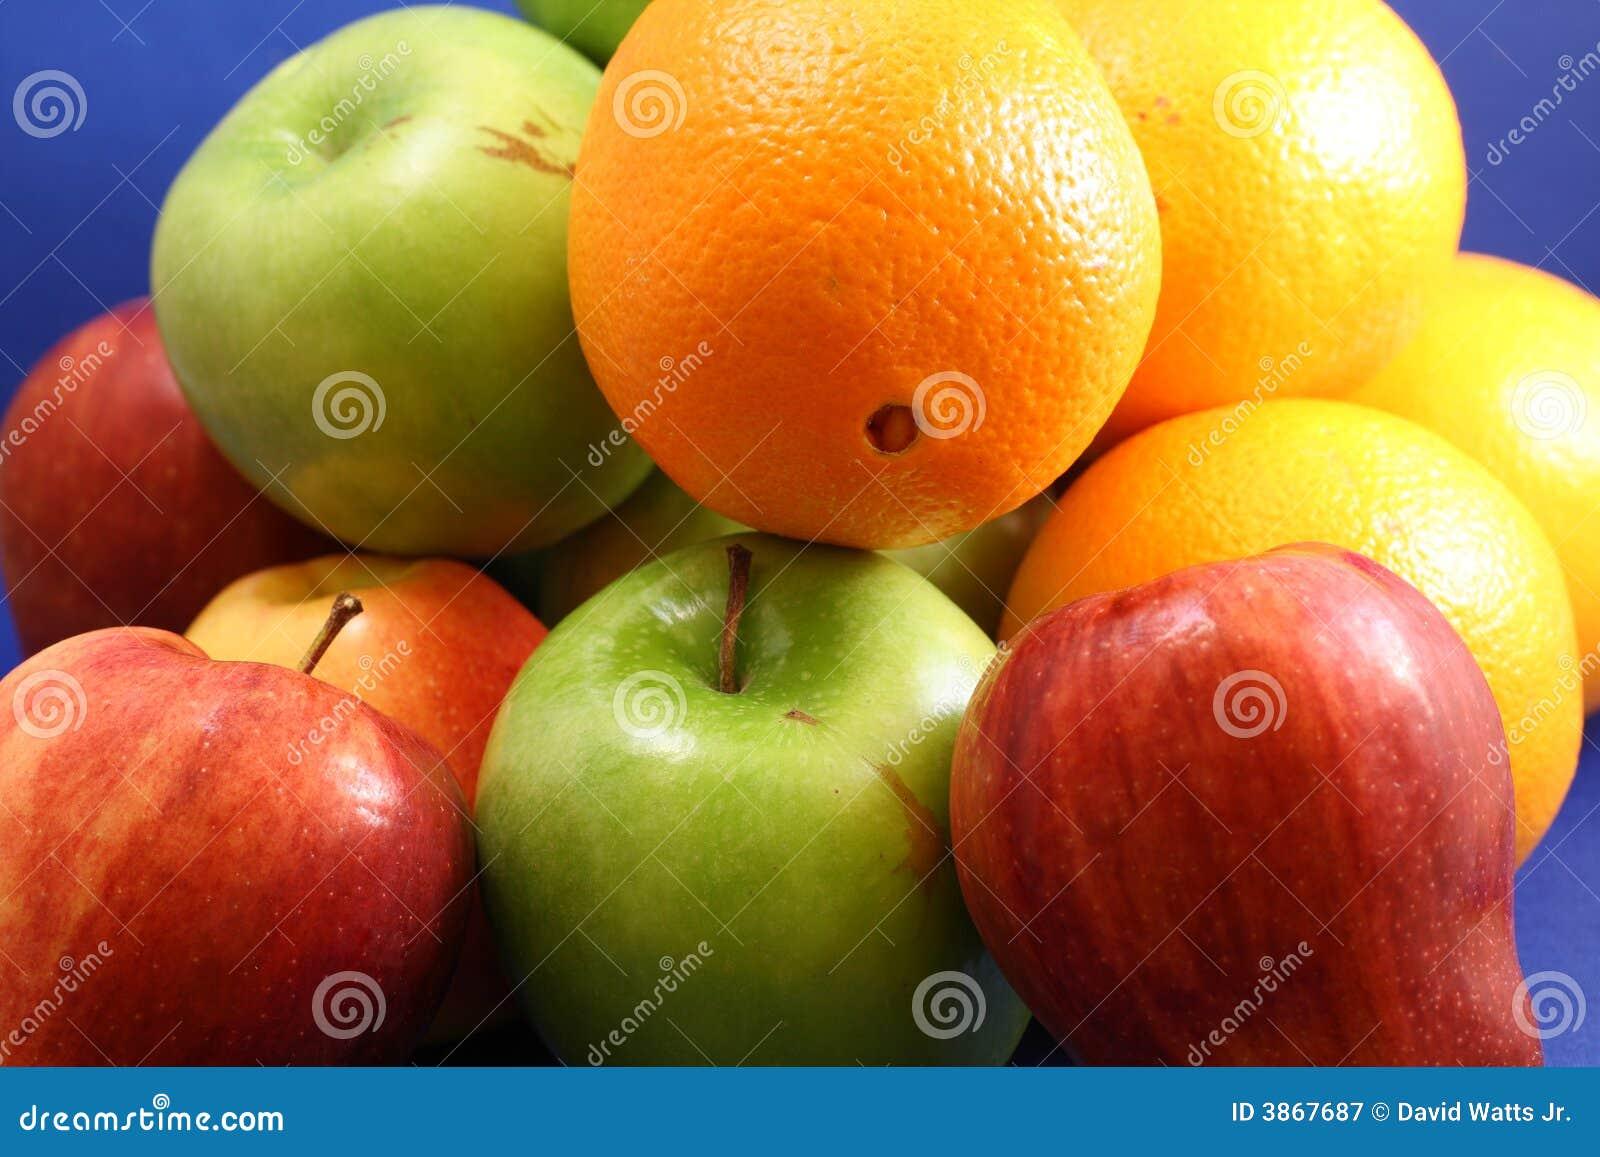 Download Apples & Oranges stock image. Image of healthy, citrus - 3867687